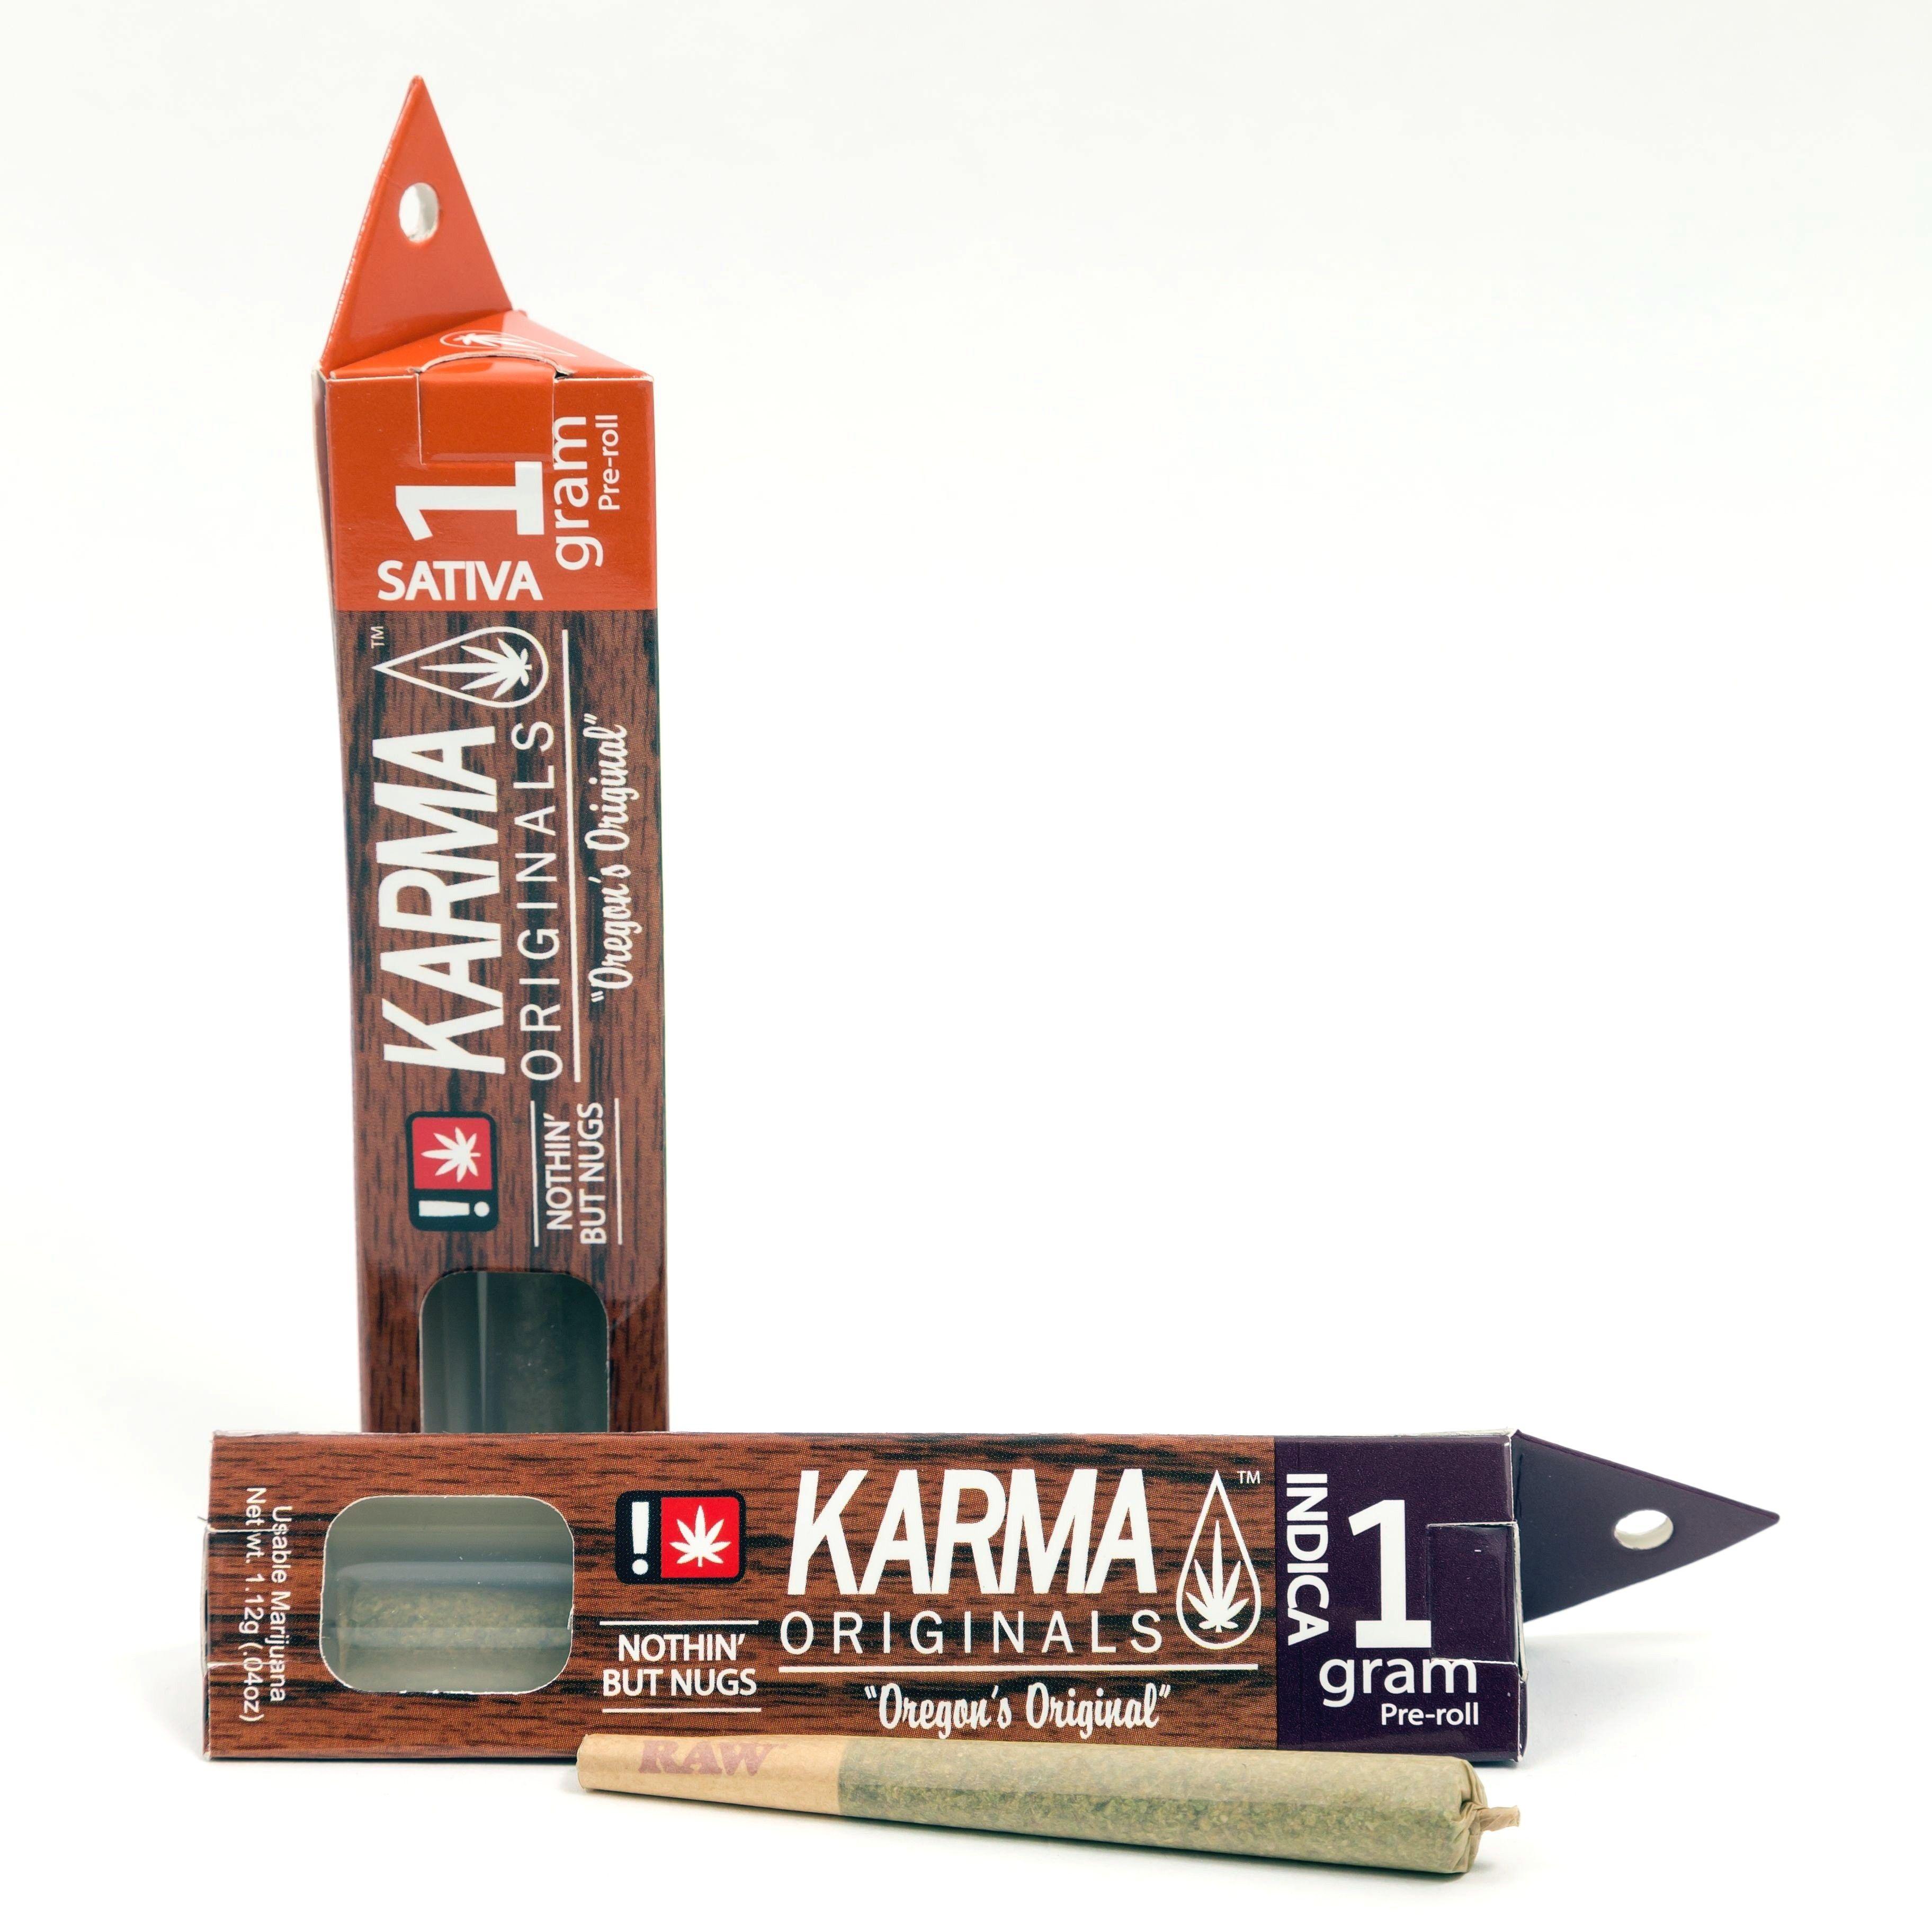 Karma Originals - White Tahoe Cookies 1g, Indica Hybrid, Pre-roll